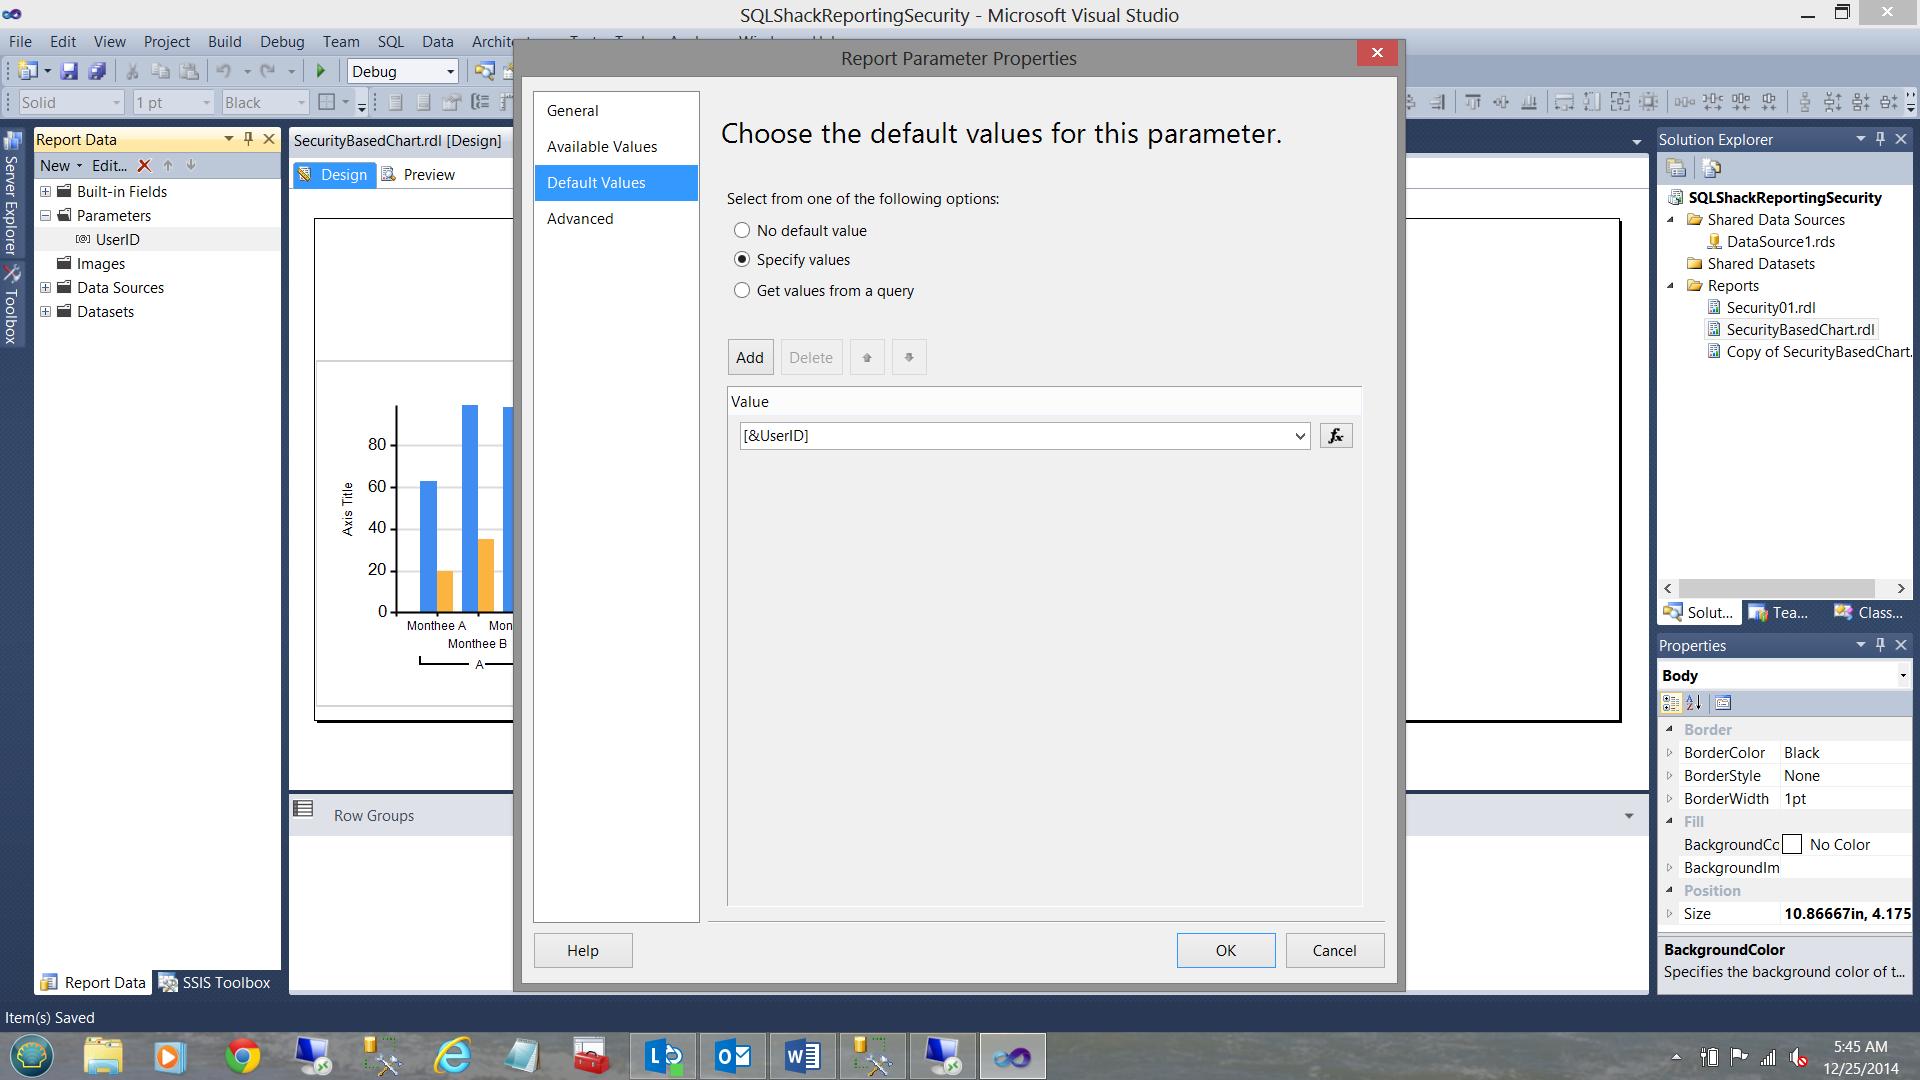 SQL Server安全机制–如何控制用户能够在报告中查看哪些数据29